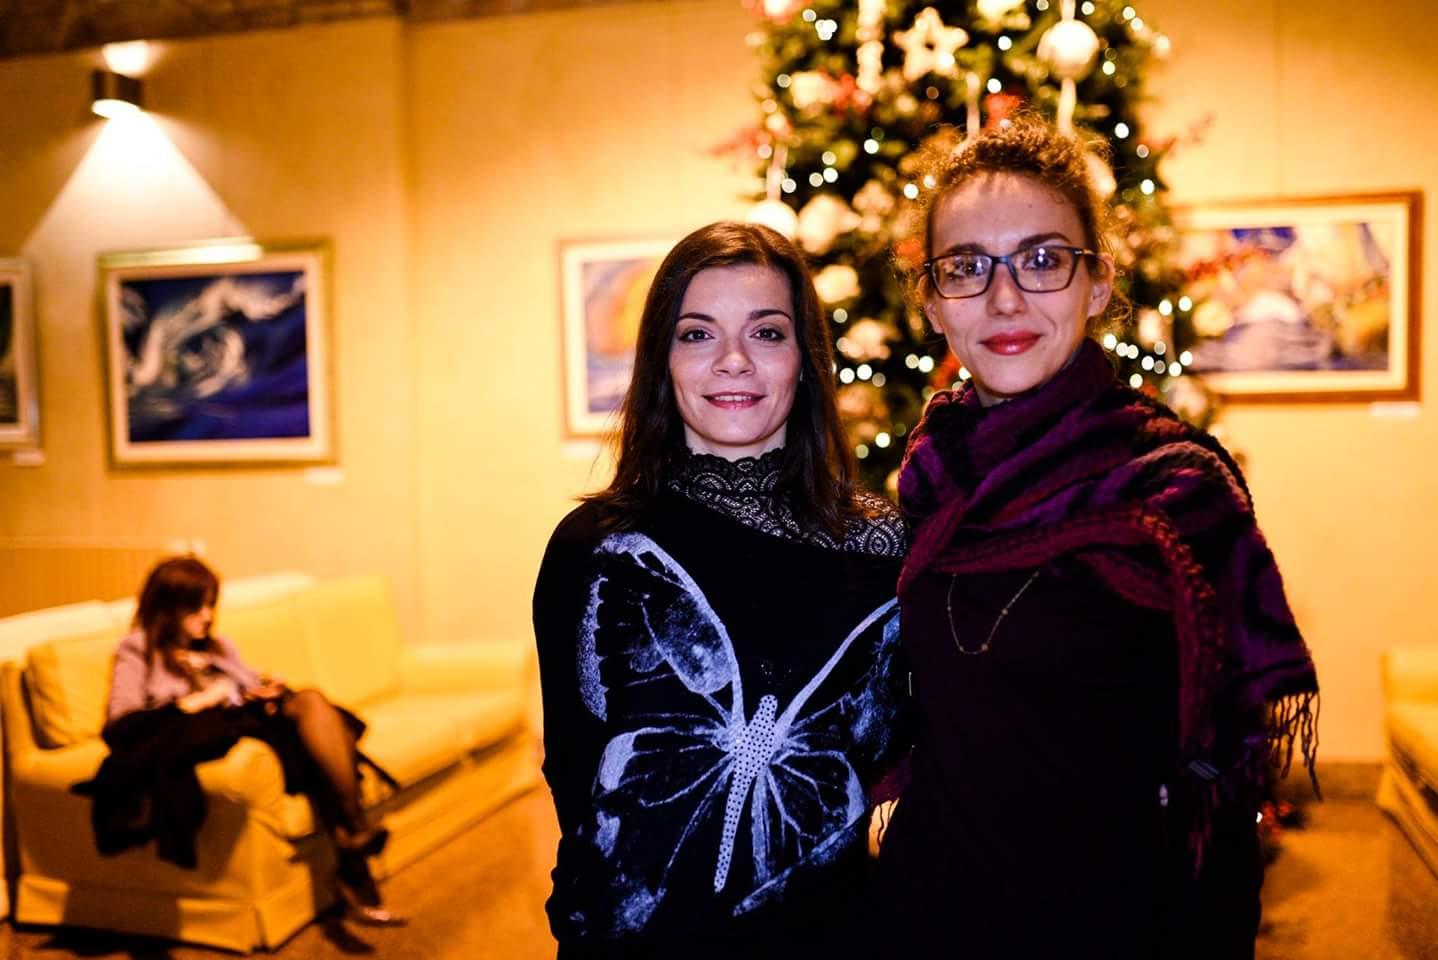 Iolanda La Carrubba e Sarah Panatta